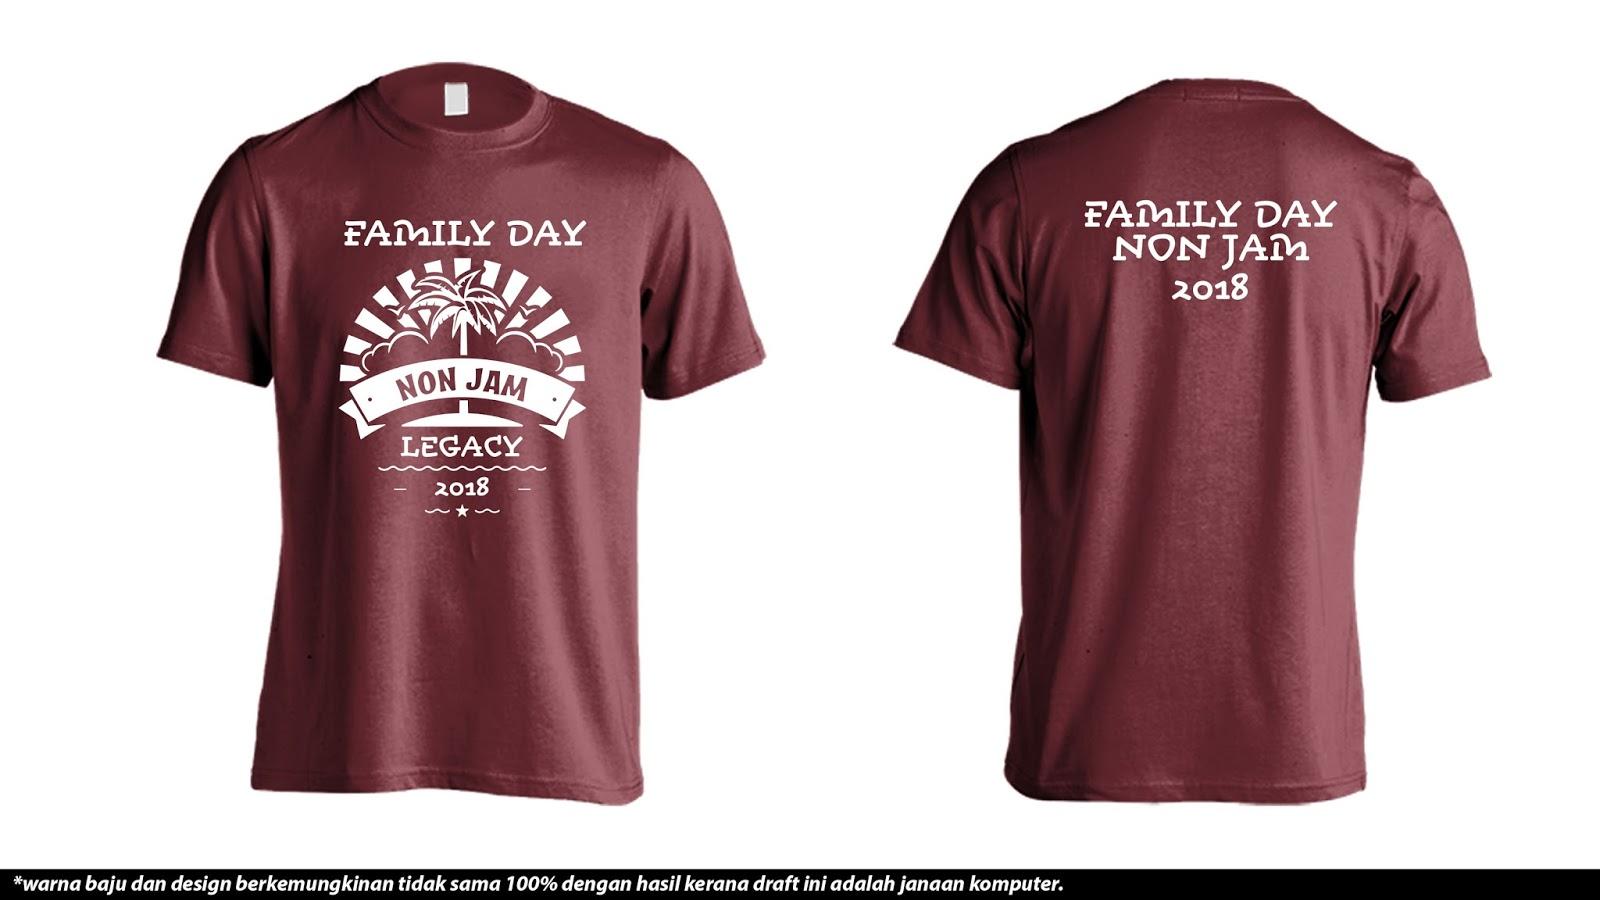 Cetak Baju Online Cetak Tshirt Family Day Non Jam Family